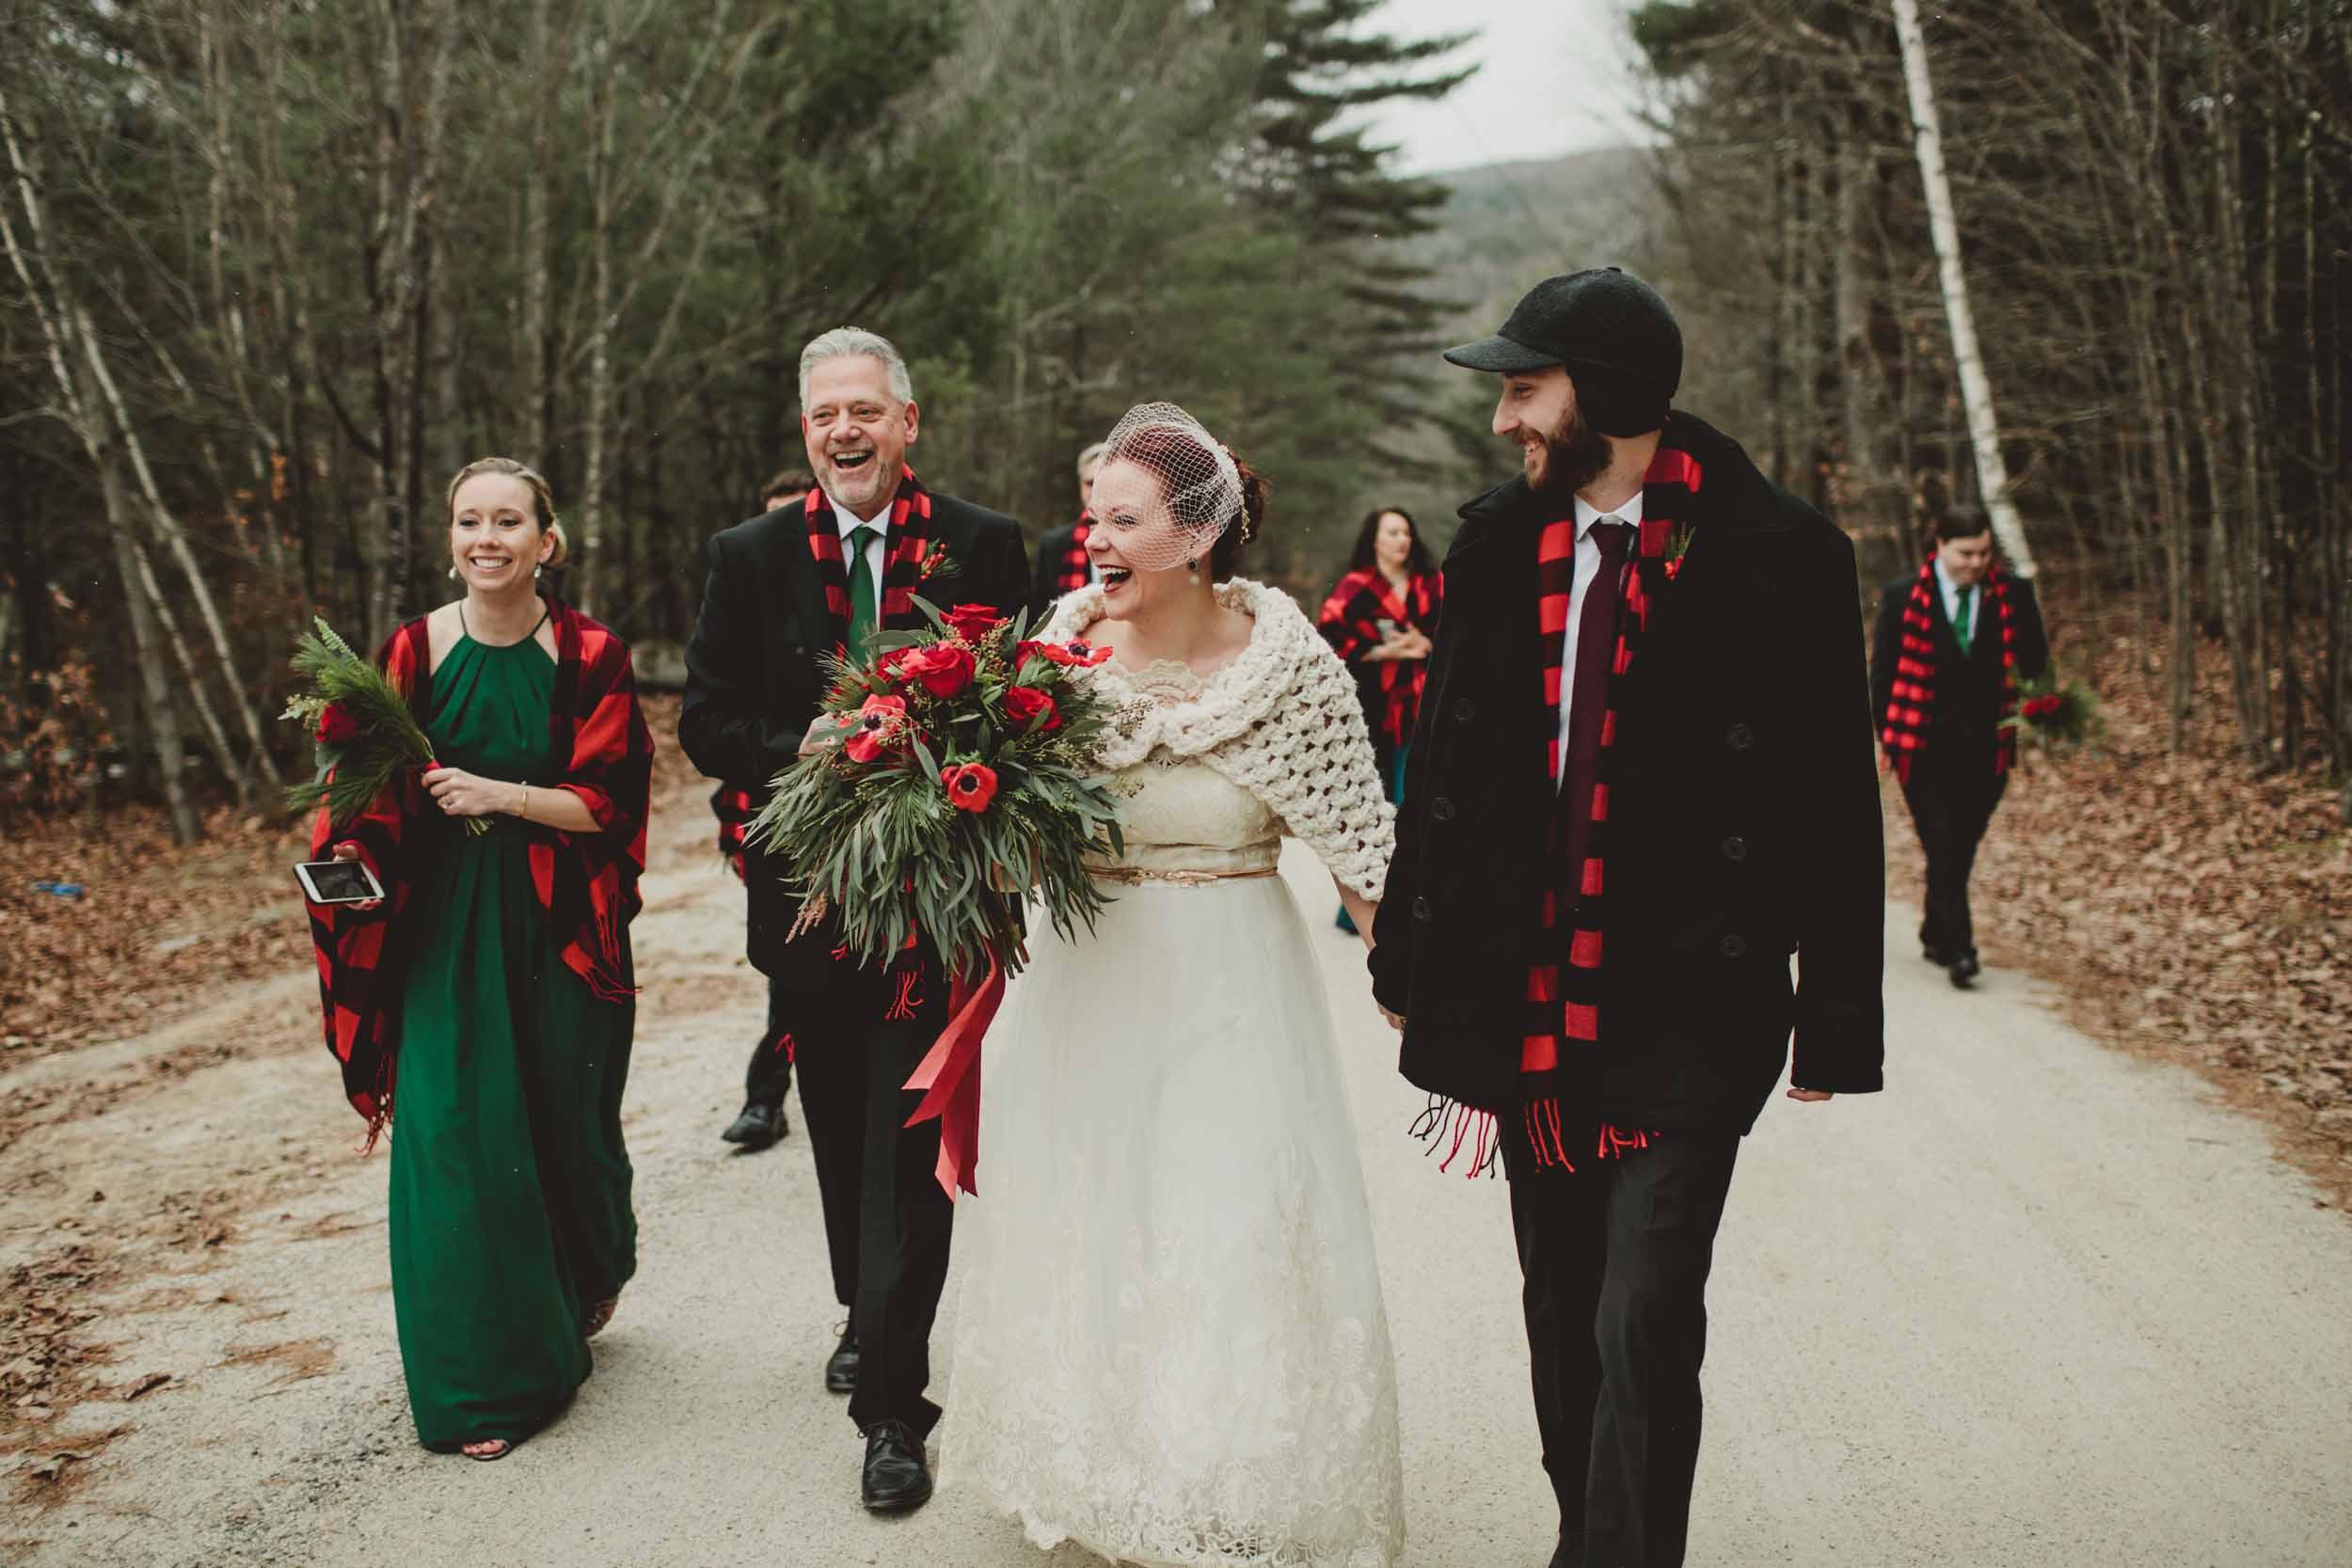 Stone-mountain-arts-wedding21.jpg